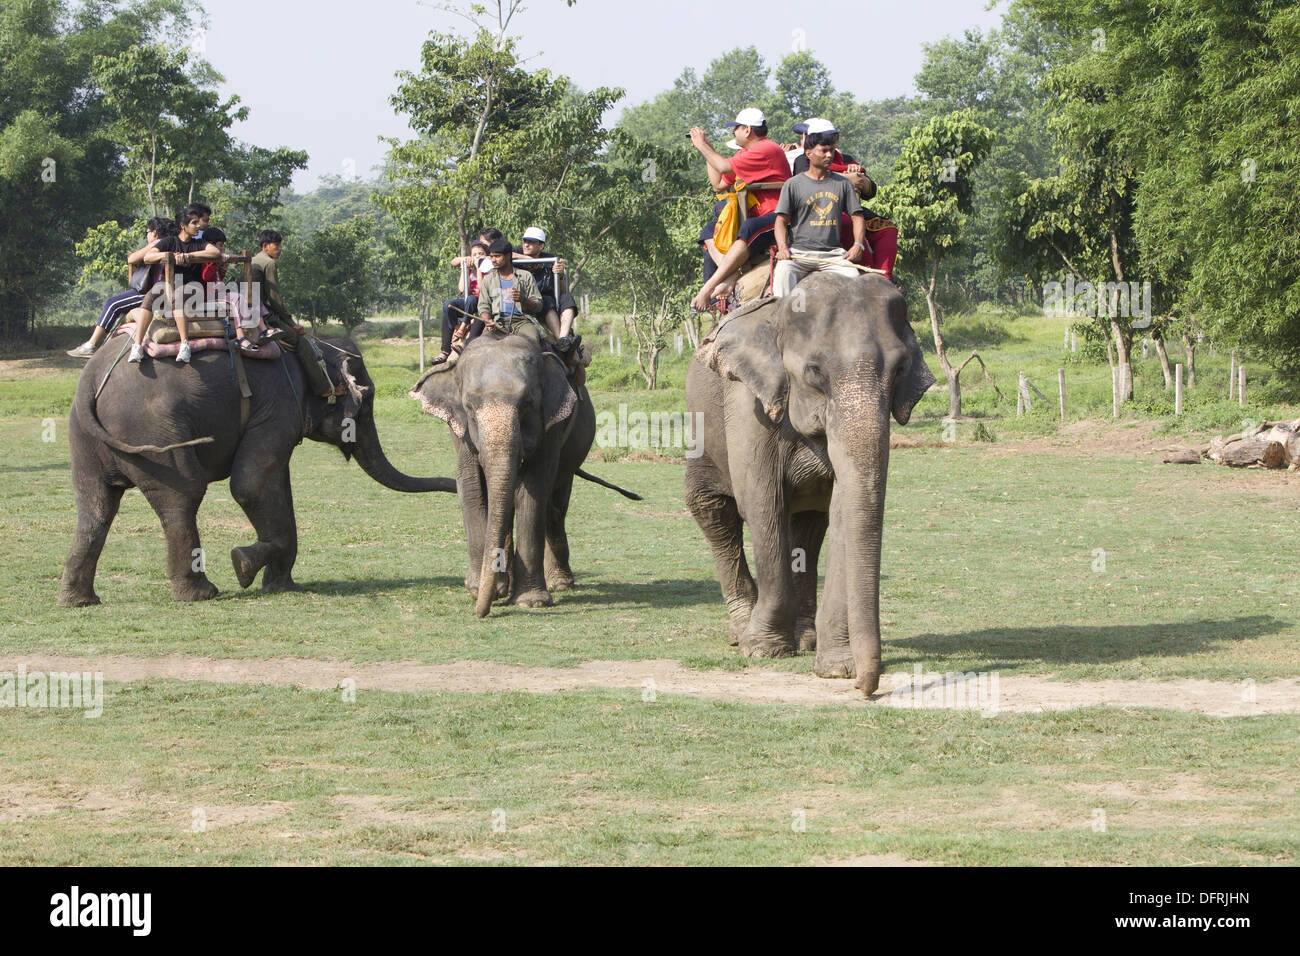 Tourists riding on elephant for elephant safari, Chitwan National